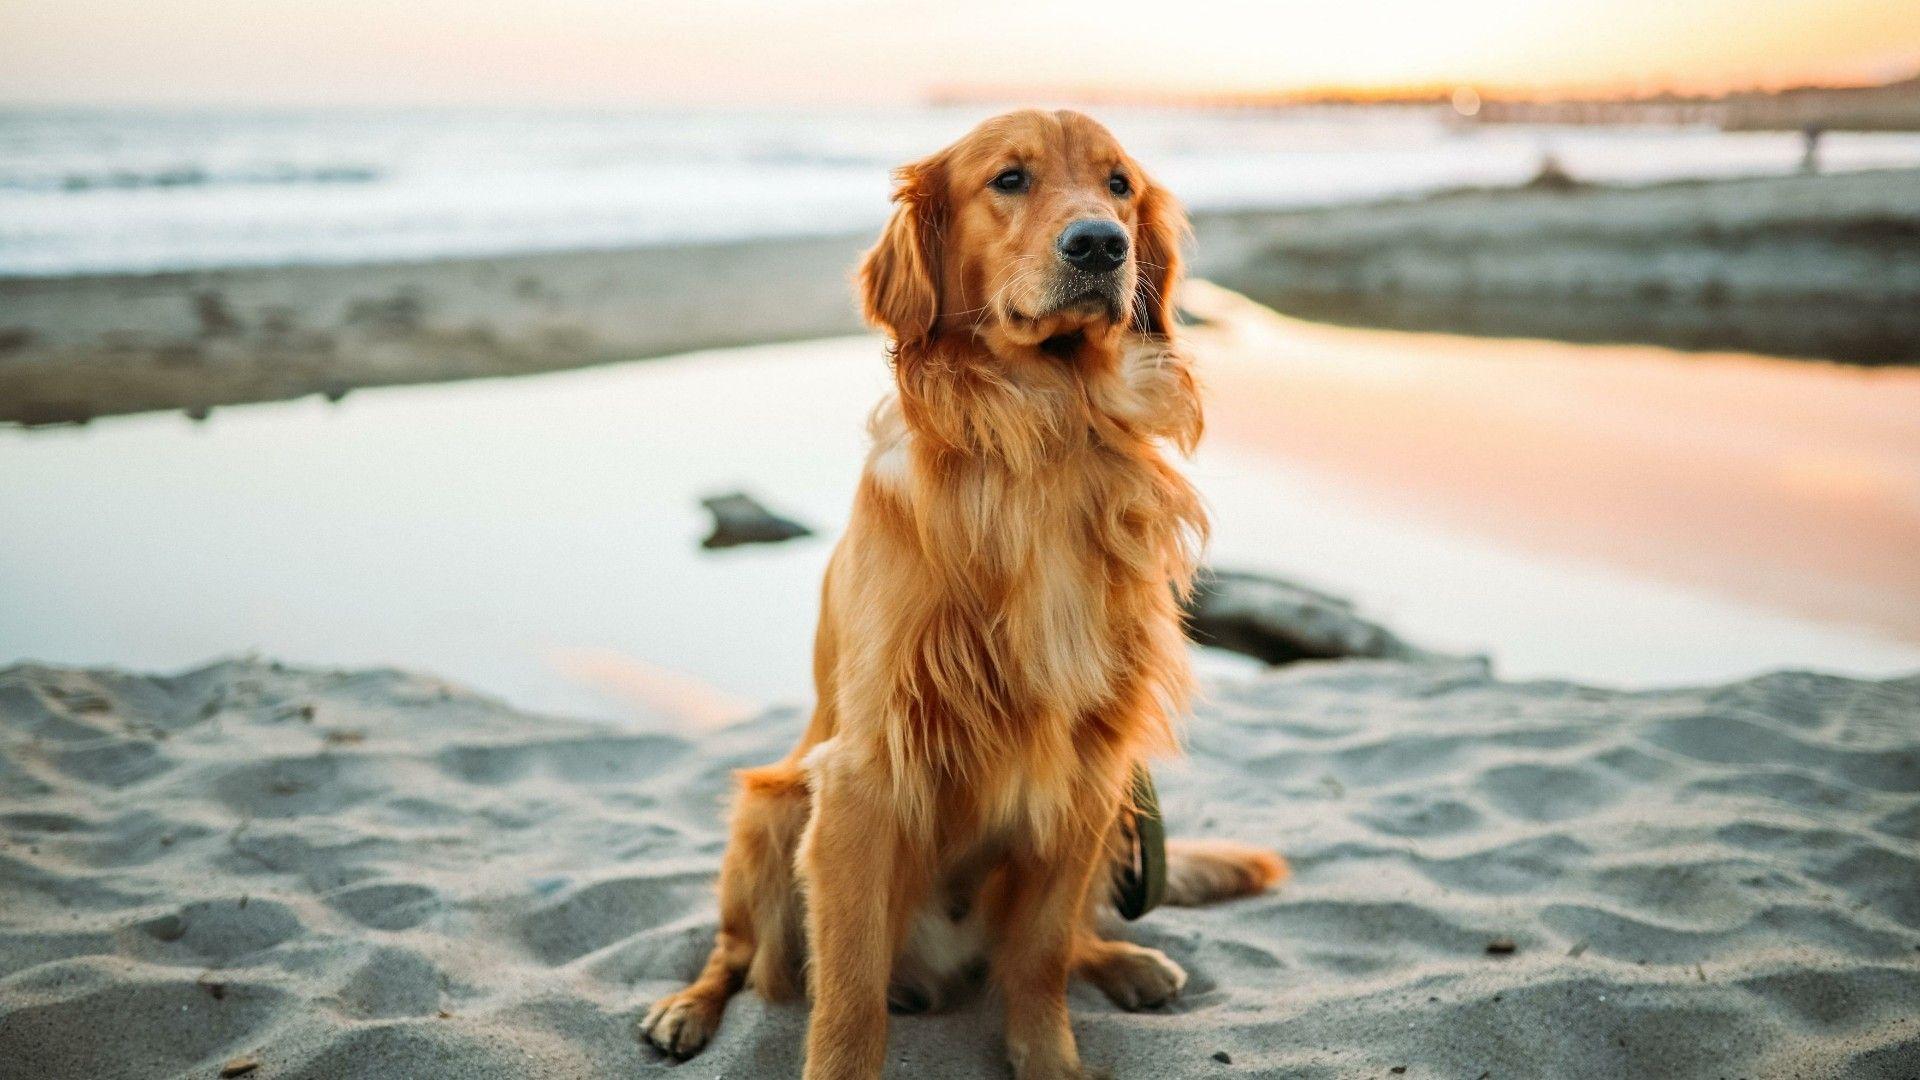 Dogilike.com :: จัดอันดับ 5 สายพันธุ์หนุ่มหล่อแห่งวงการสุนัข